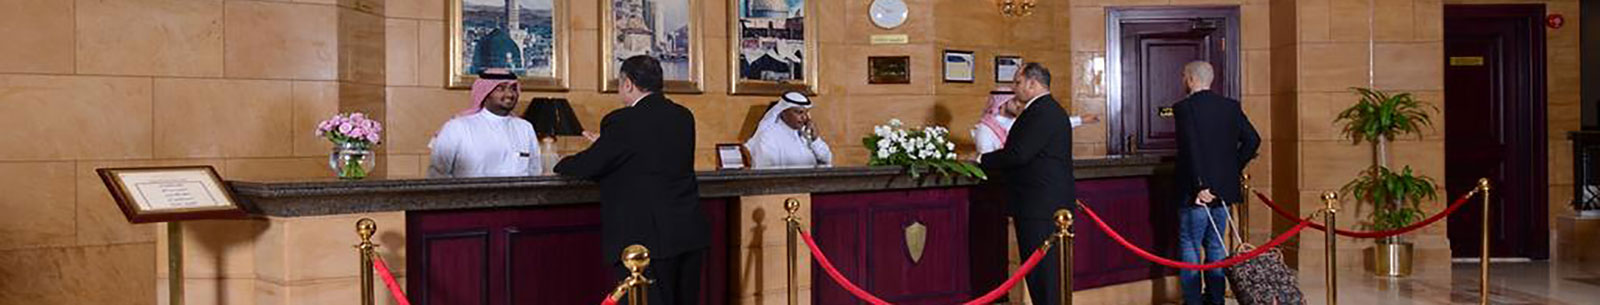 bellevue al basmah resort in jeddah bluebay hotels resorts rh bluebayresorts com